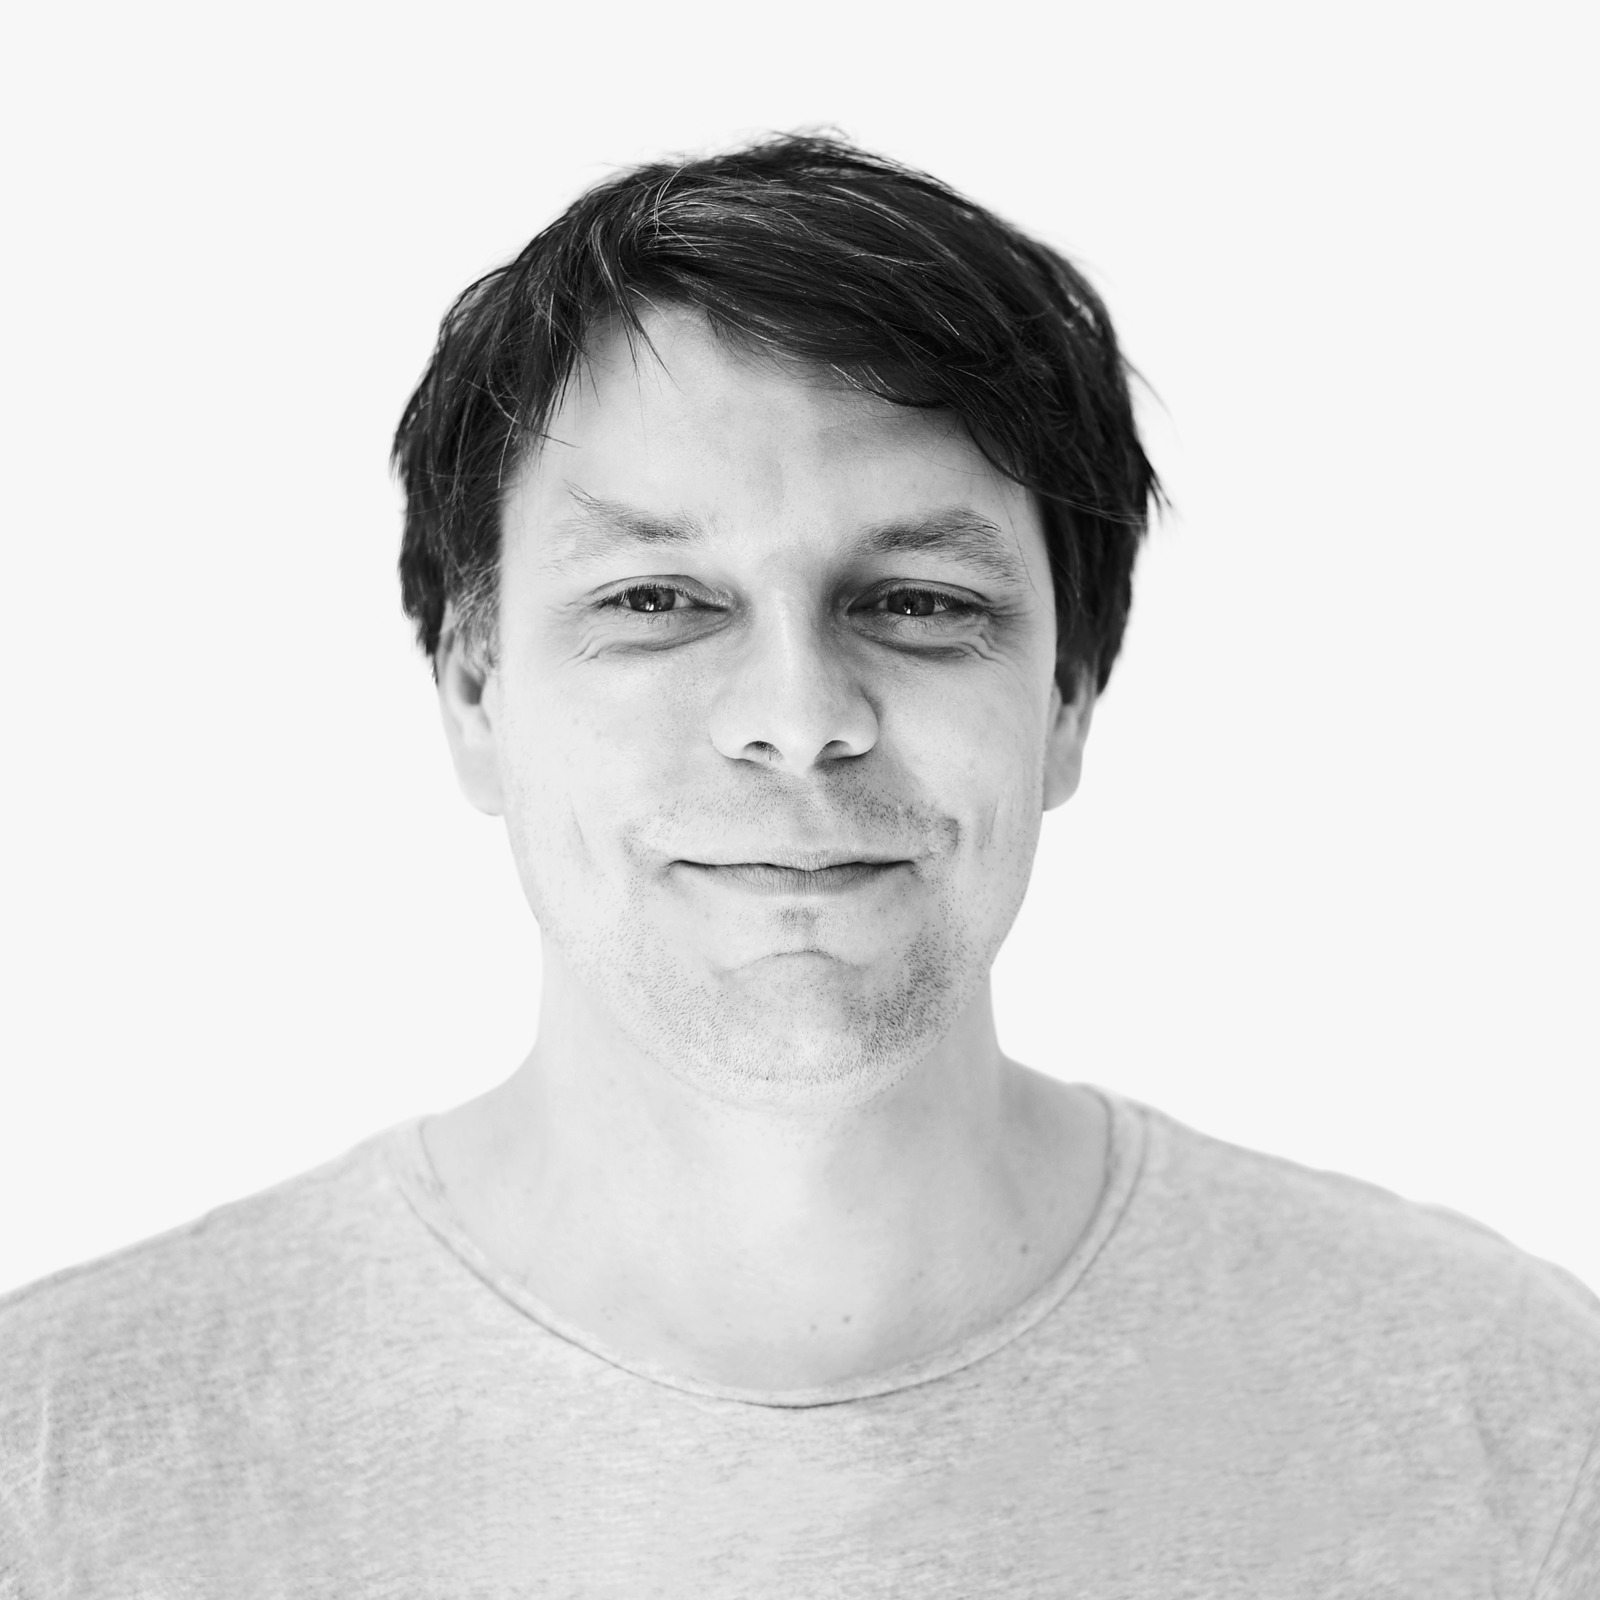 Portrait of Sven Johann